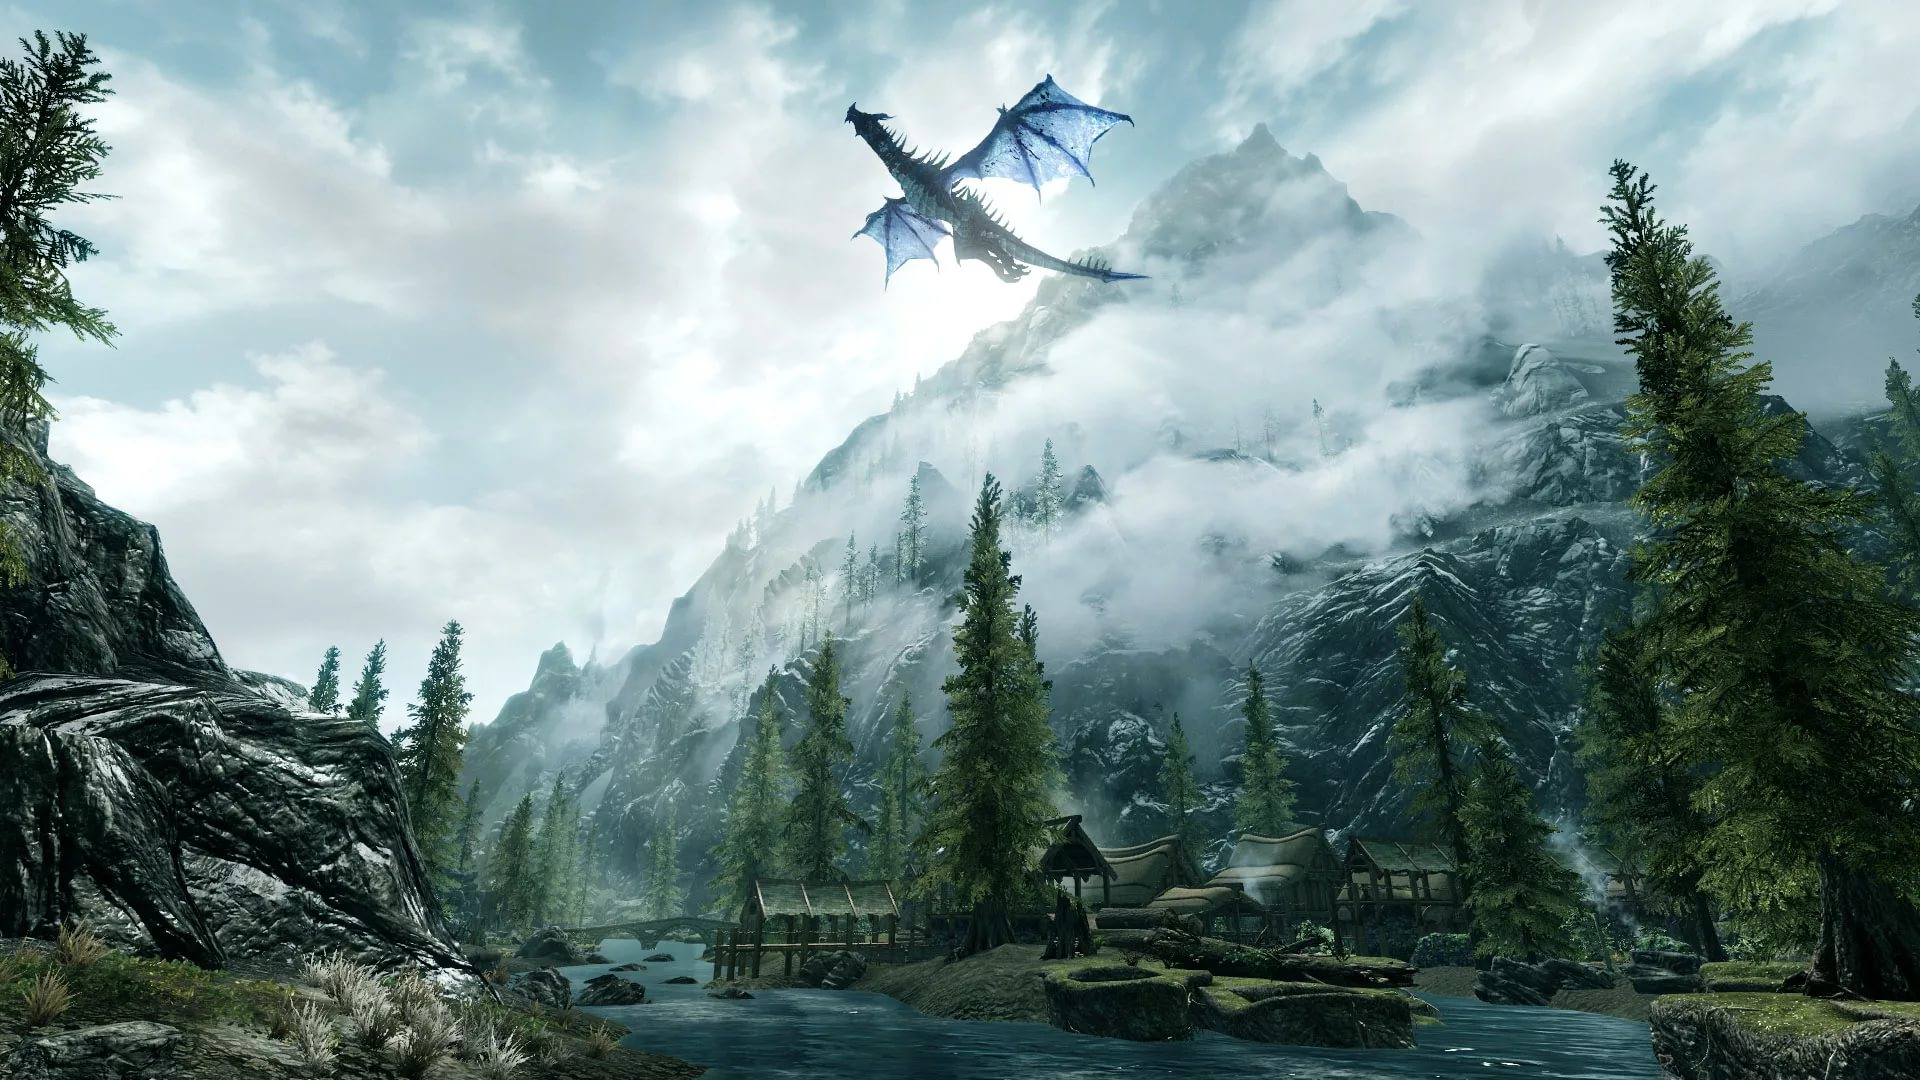 IMG_5376.JPG - Elder Scrolls 5: Skyrim, the Арт